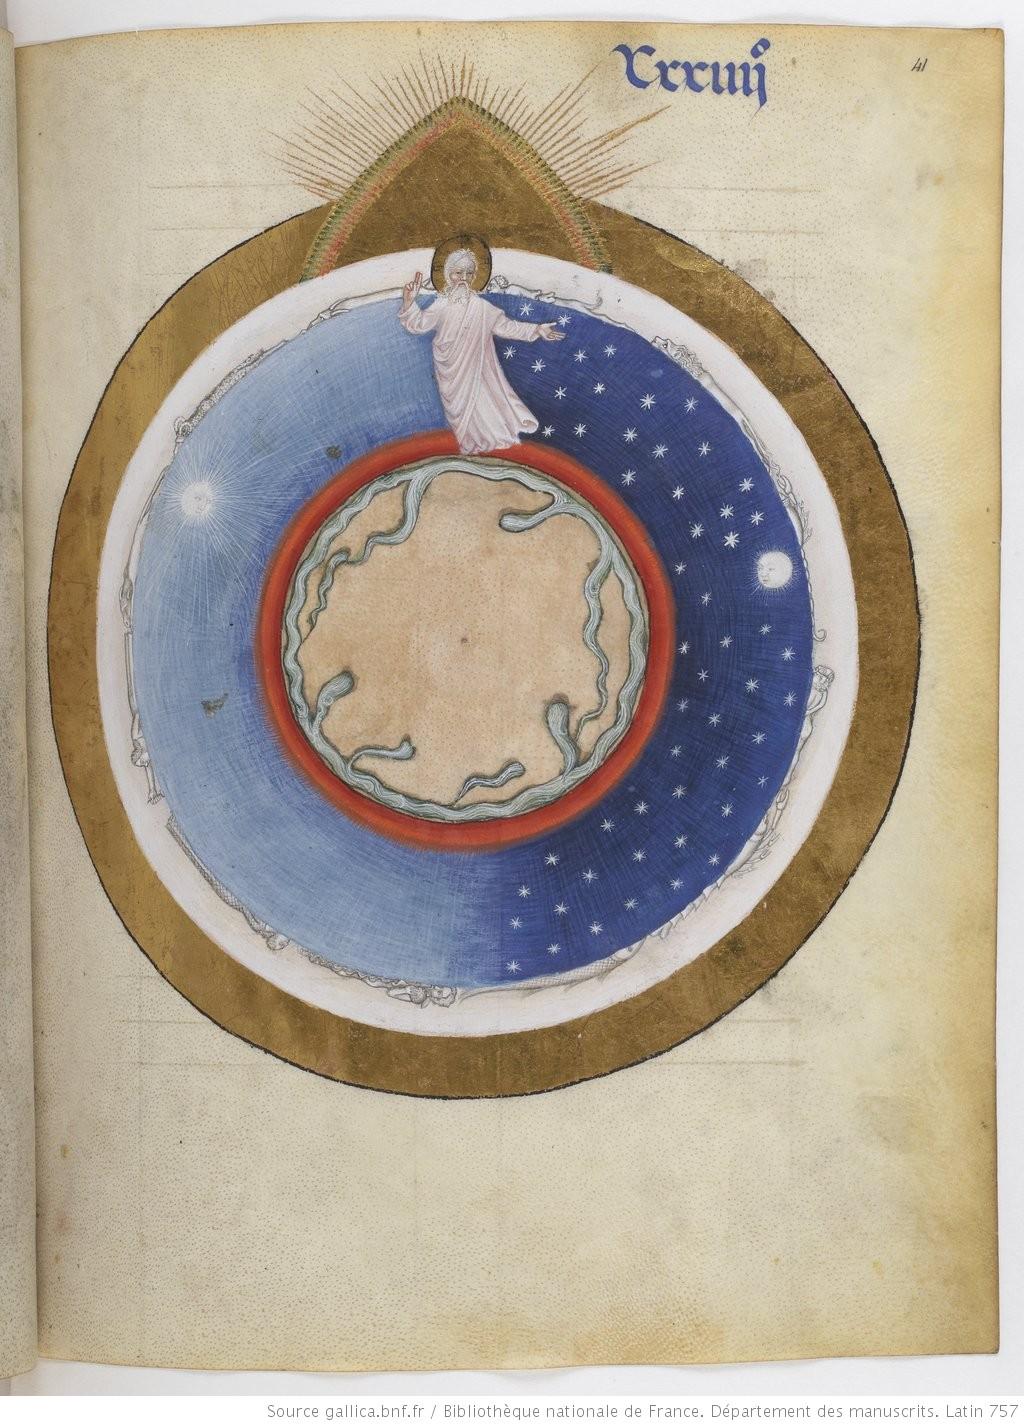 4 Mercredi Missel a l'usage des freres mineurs, Lombardie, 1388, Gallica BNF ms. lat. 757, fol. 48r